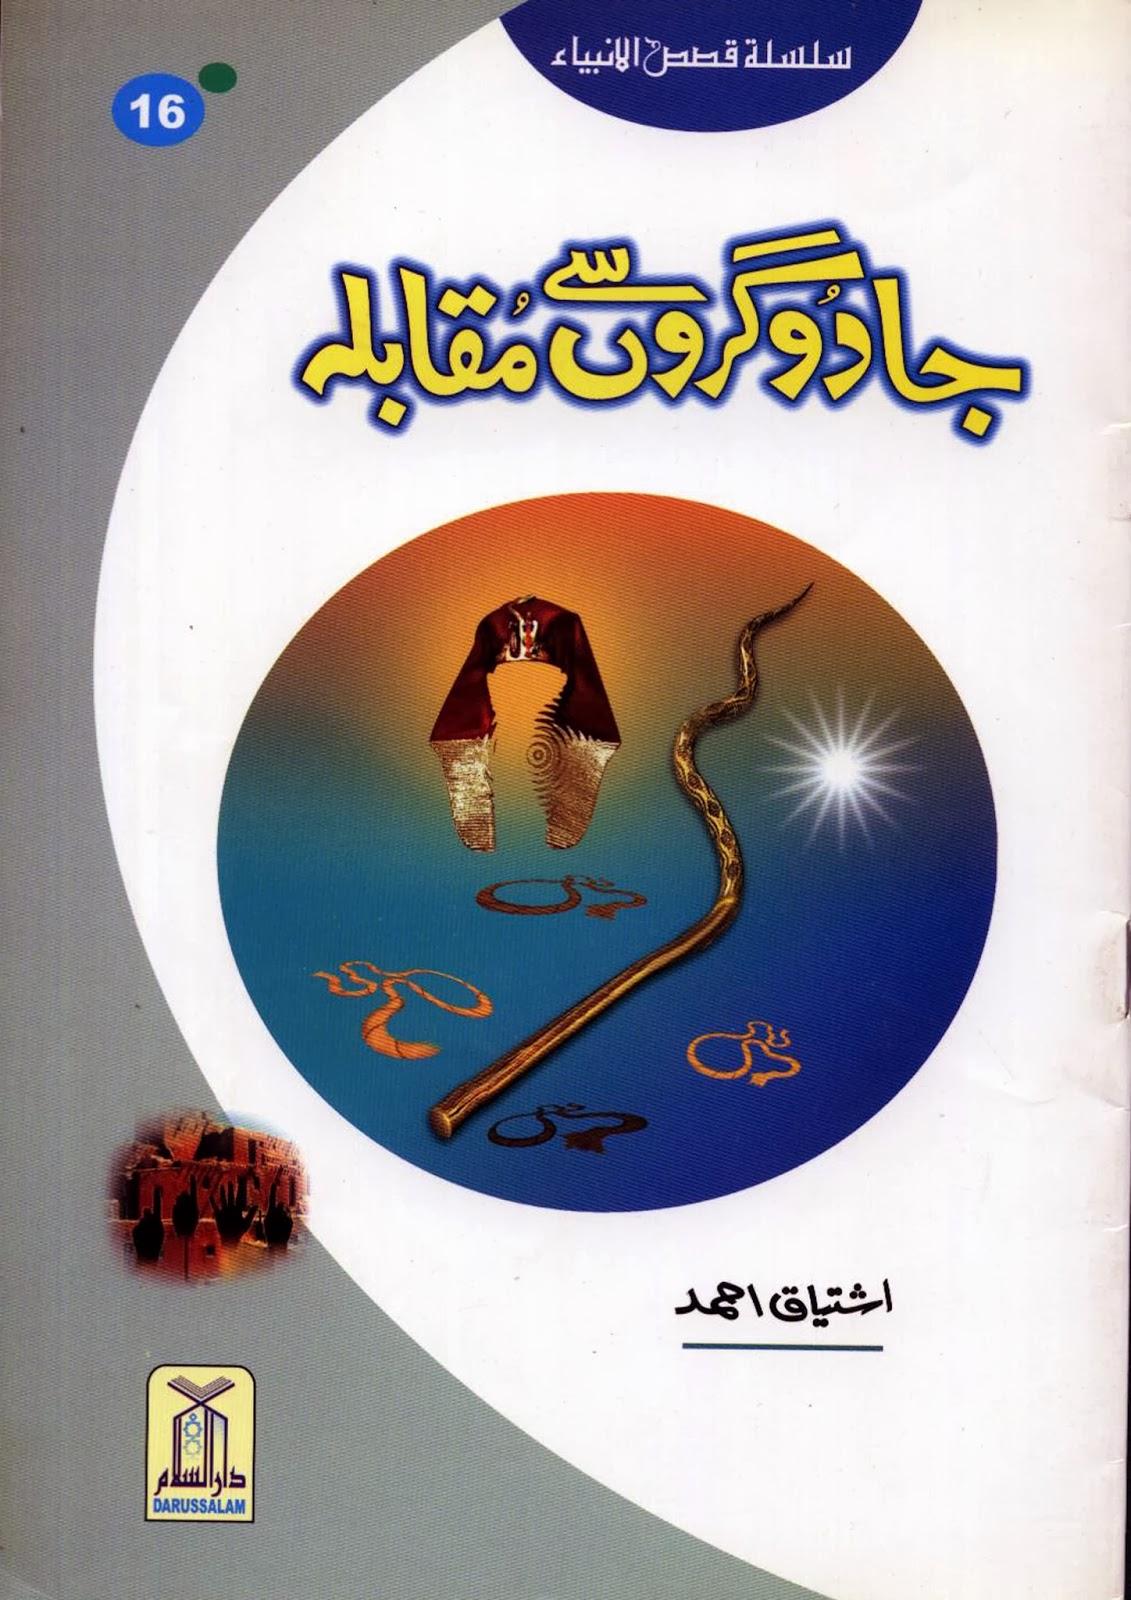 http://urduguru1.blogspot.com/2014/03/jadoghron-sy-moqabla-prophet-musa-as.html